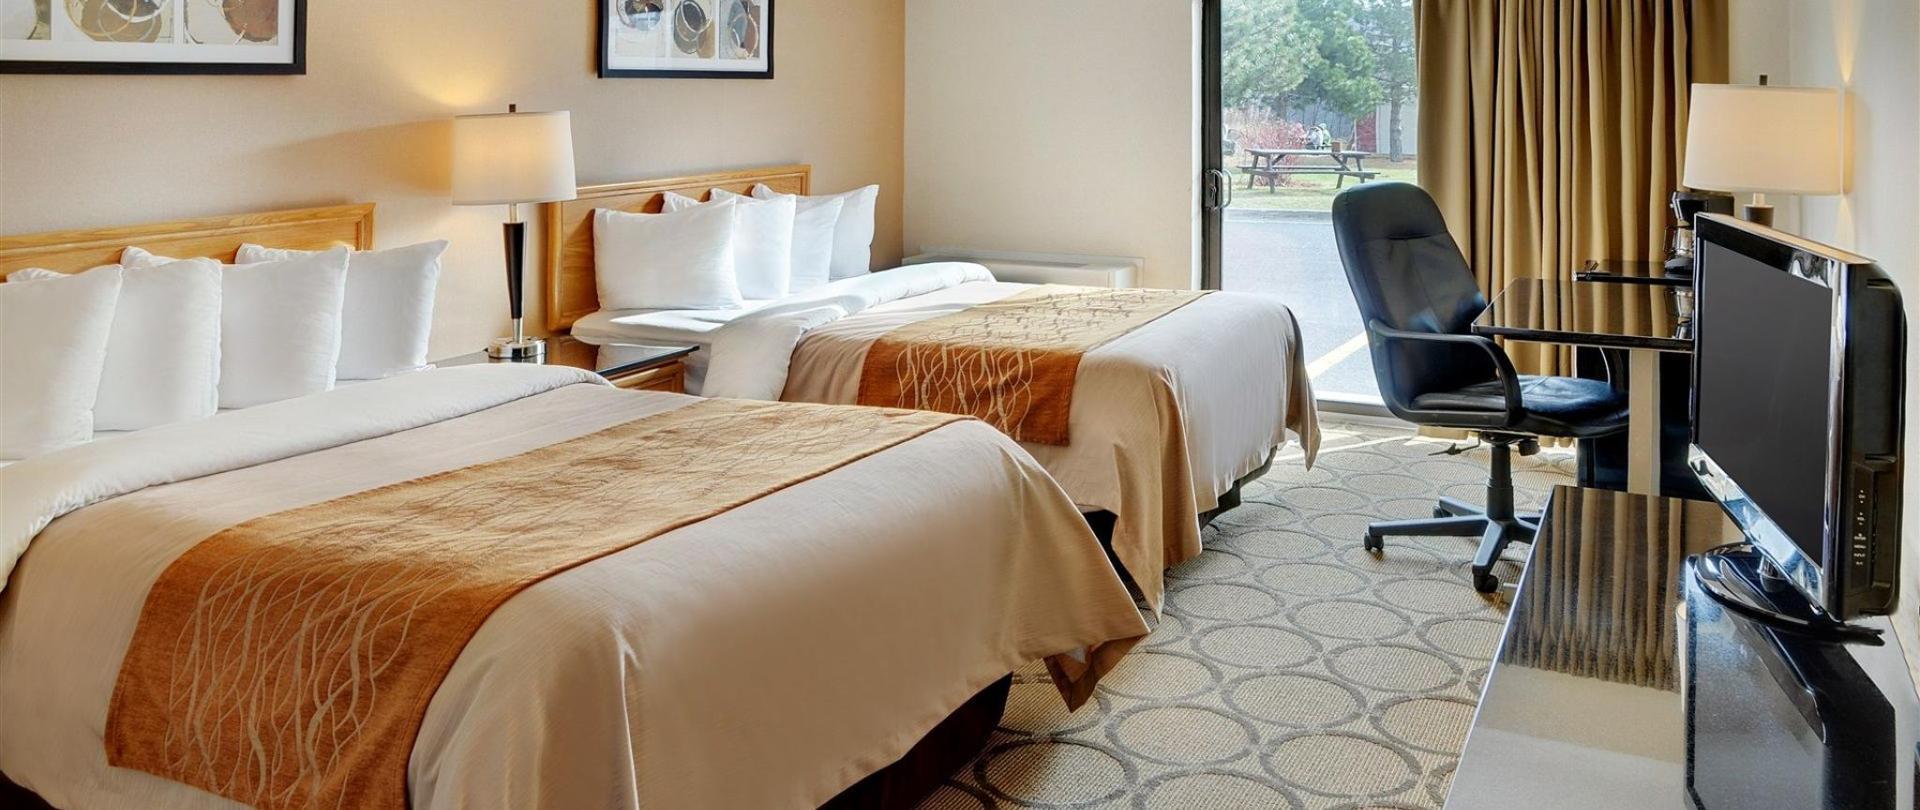 chambre-avec-deux-oreillers-lits-drive-up-patio-door-access1.jpg